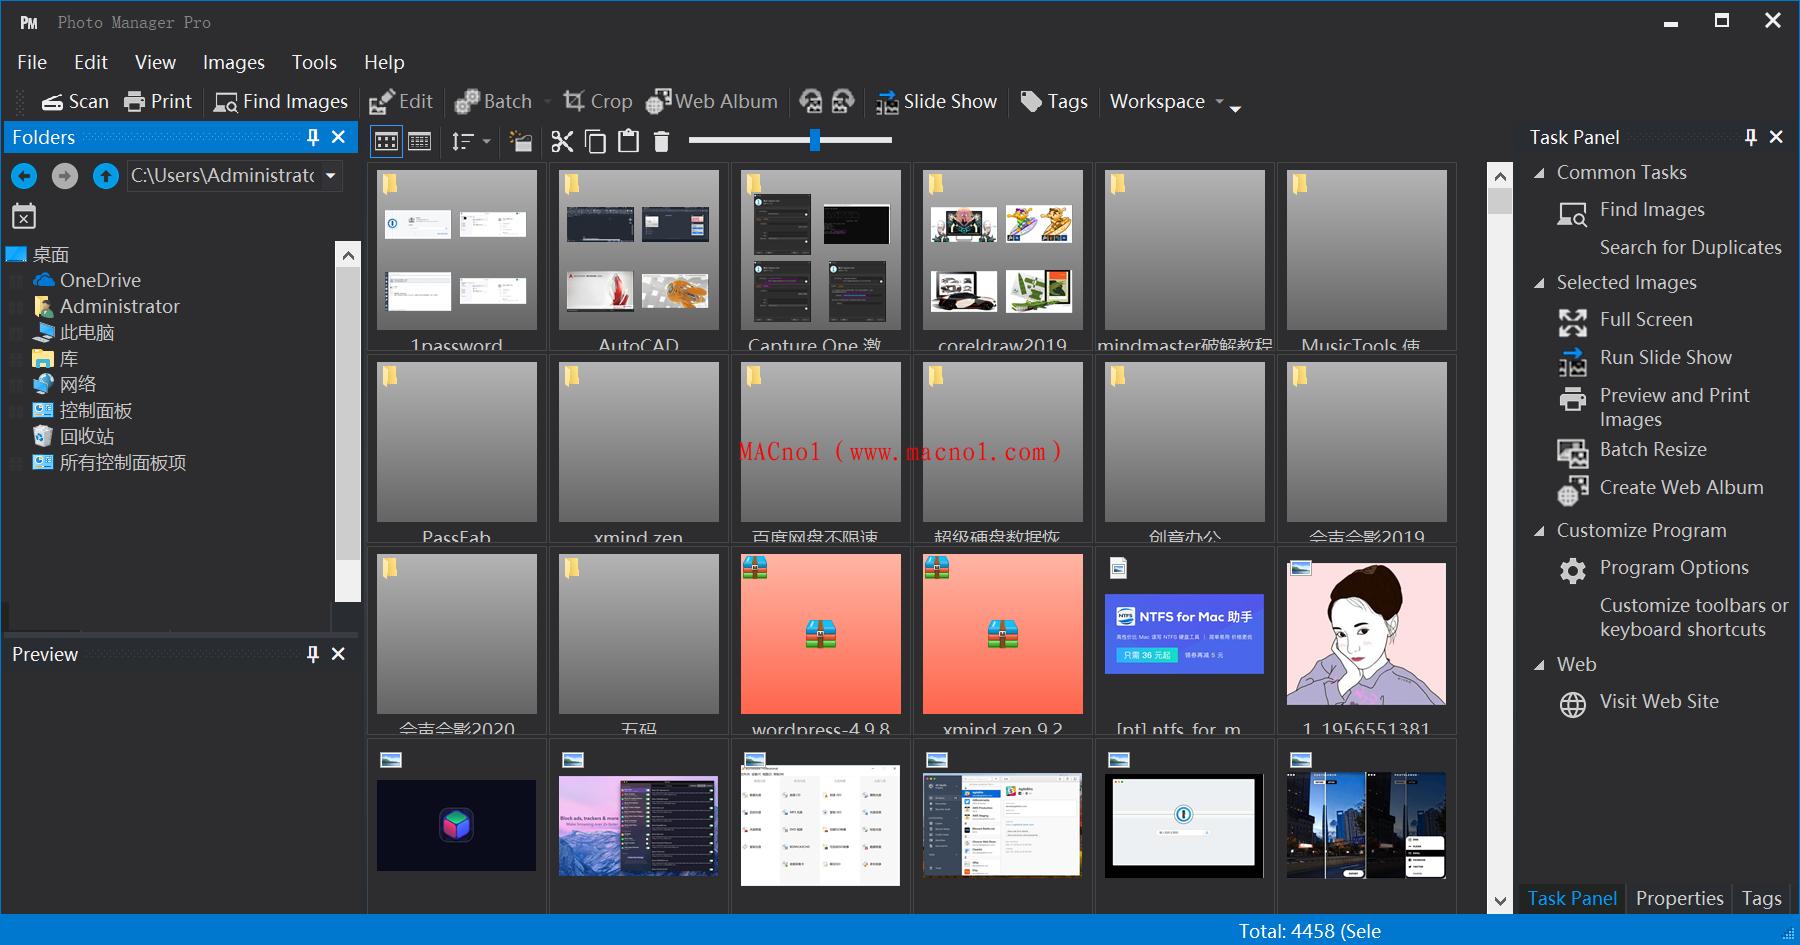 Proxima Photo Manager(照片管理软件)v4.0.0 注册便捷版 免激活码